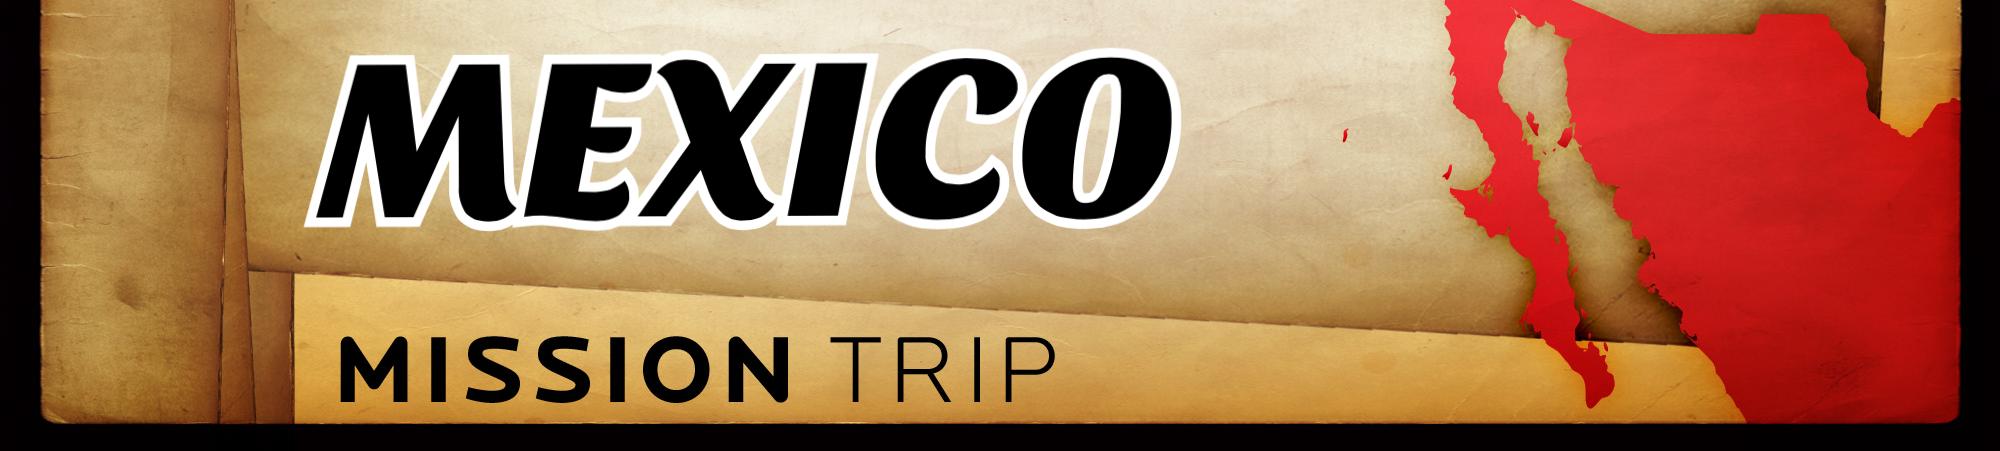 mission trip mexico_wide c_nv.jpg